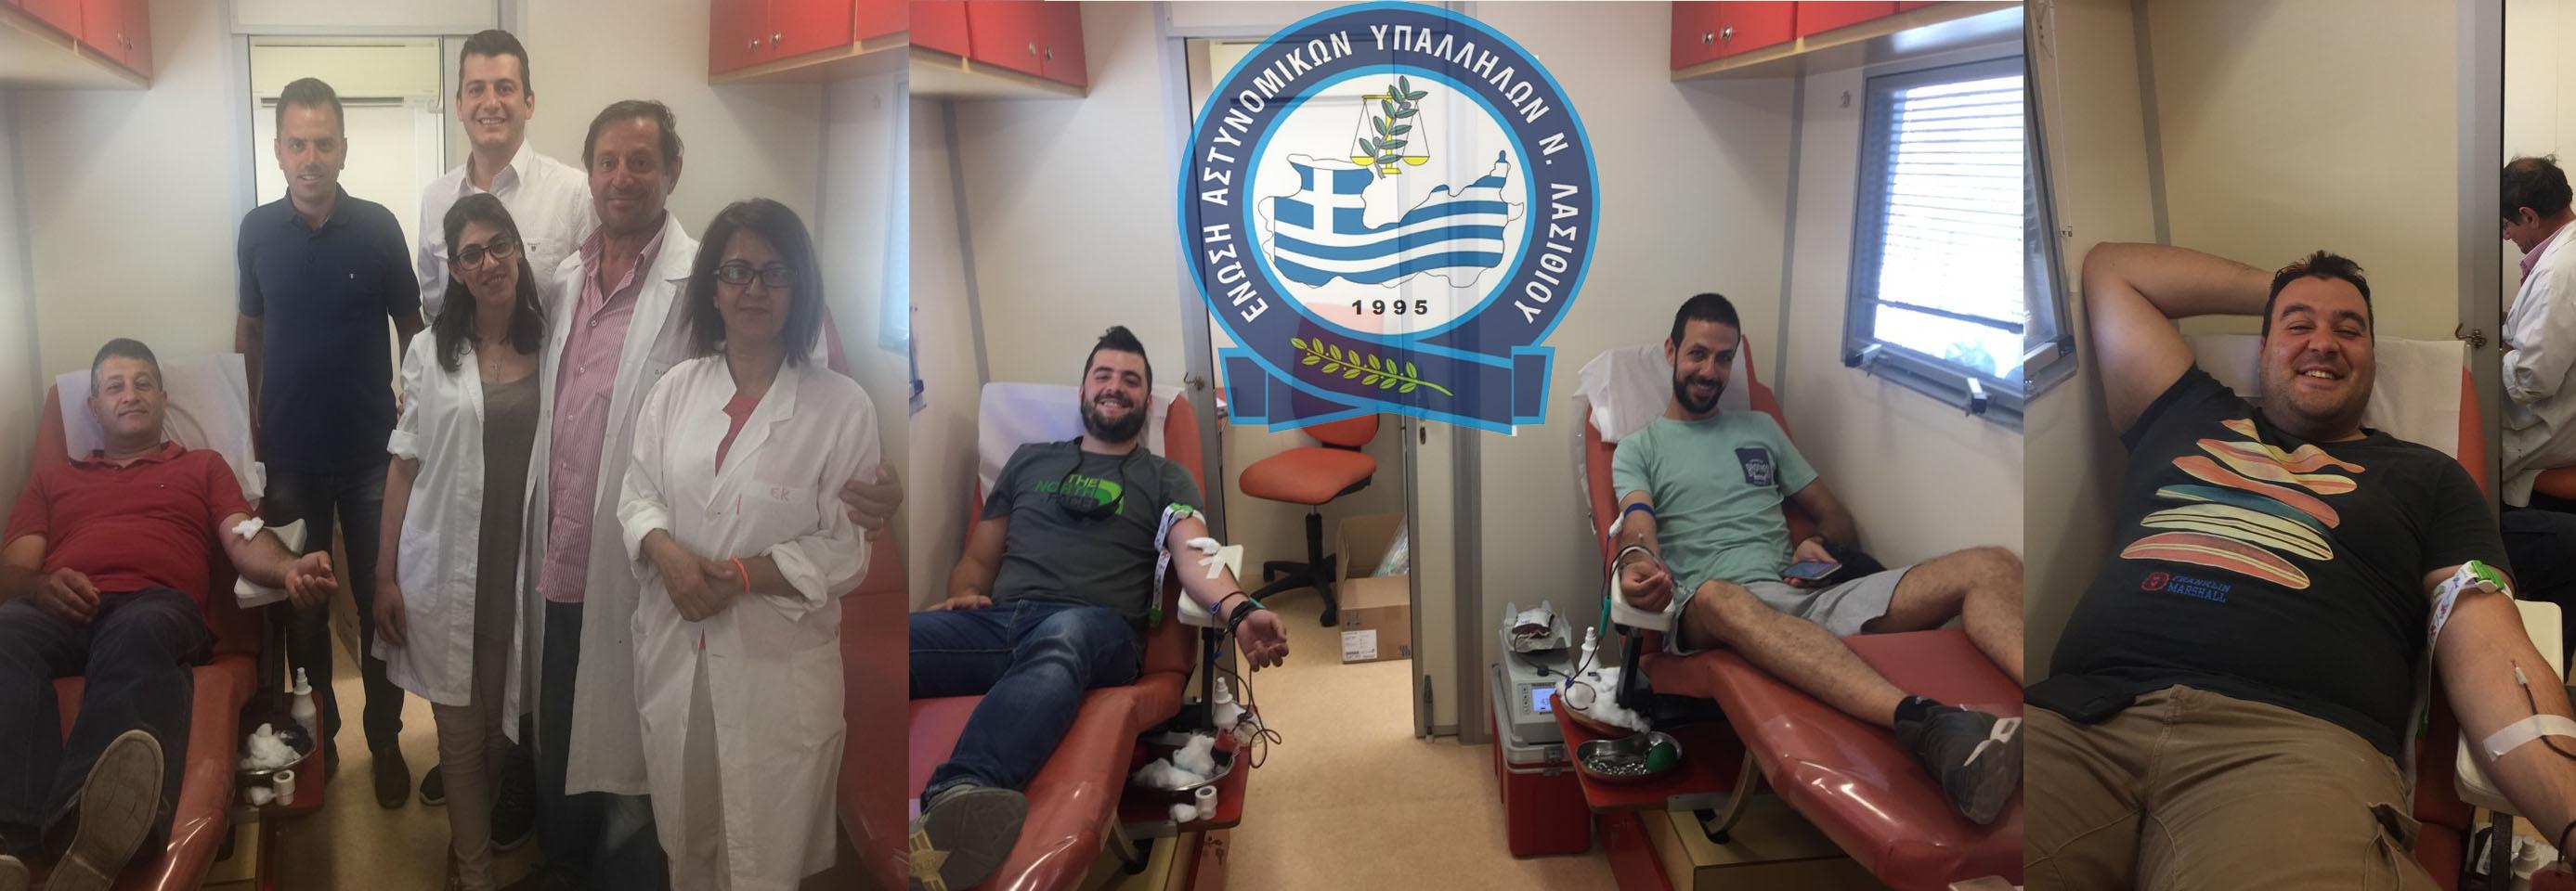 <p>Με επιτυχία στέφθηκε για ακόμη μια φορά, η 2η εθελοντική αιμοδοσία που διοργάνωσε η Ένωσή μας, την Τρίτη 03/07/2018 και κατά τις ώρες 09:00 &#8211; 13:30 έμπροσθεν του Α.Τ. Αγίου Νικολάου Λασιθίου, σε συνεργασία με την κινητή μονάδα αιμοδοσίας του Βενιζελείου – Πανανείου Γενικού Νοσοκομείου Ηρακλείου Κρήτης. Με ιδιαίτερη χαρά [&hellip;]</p>